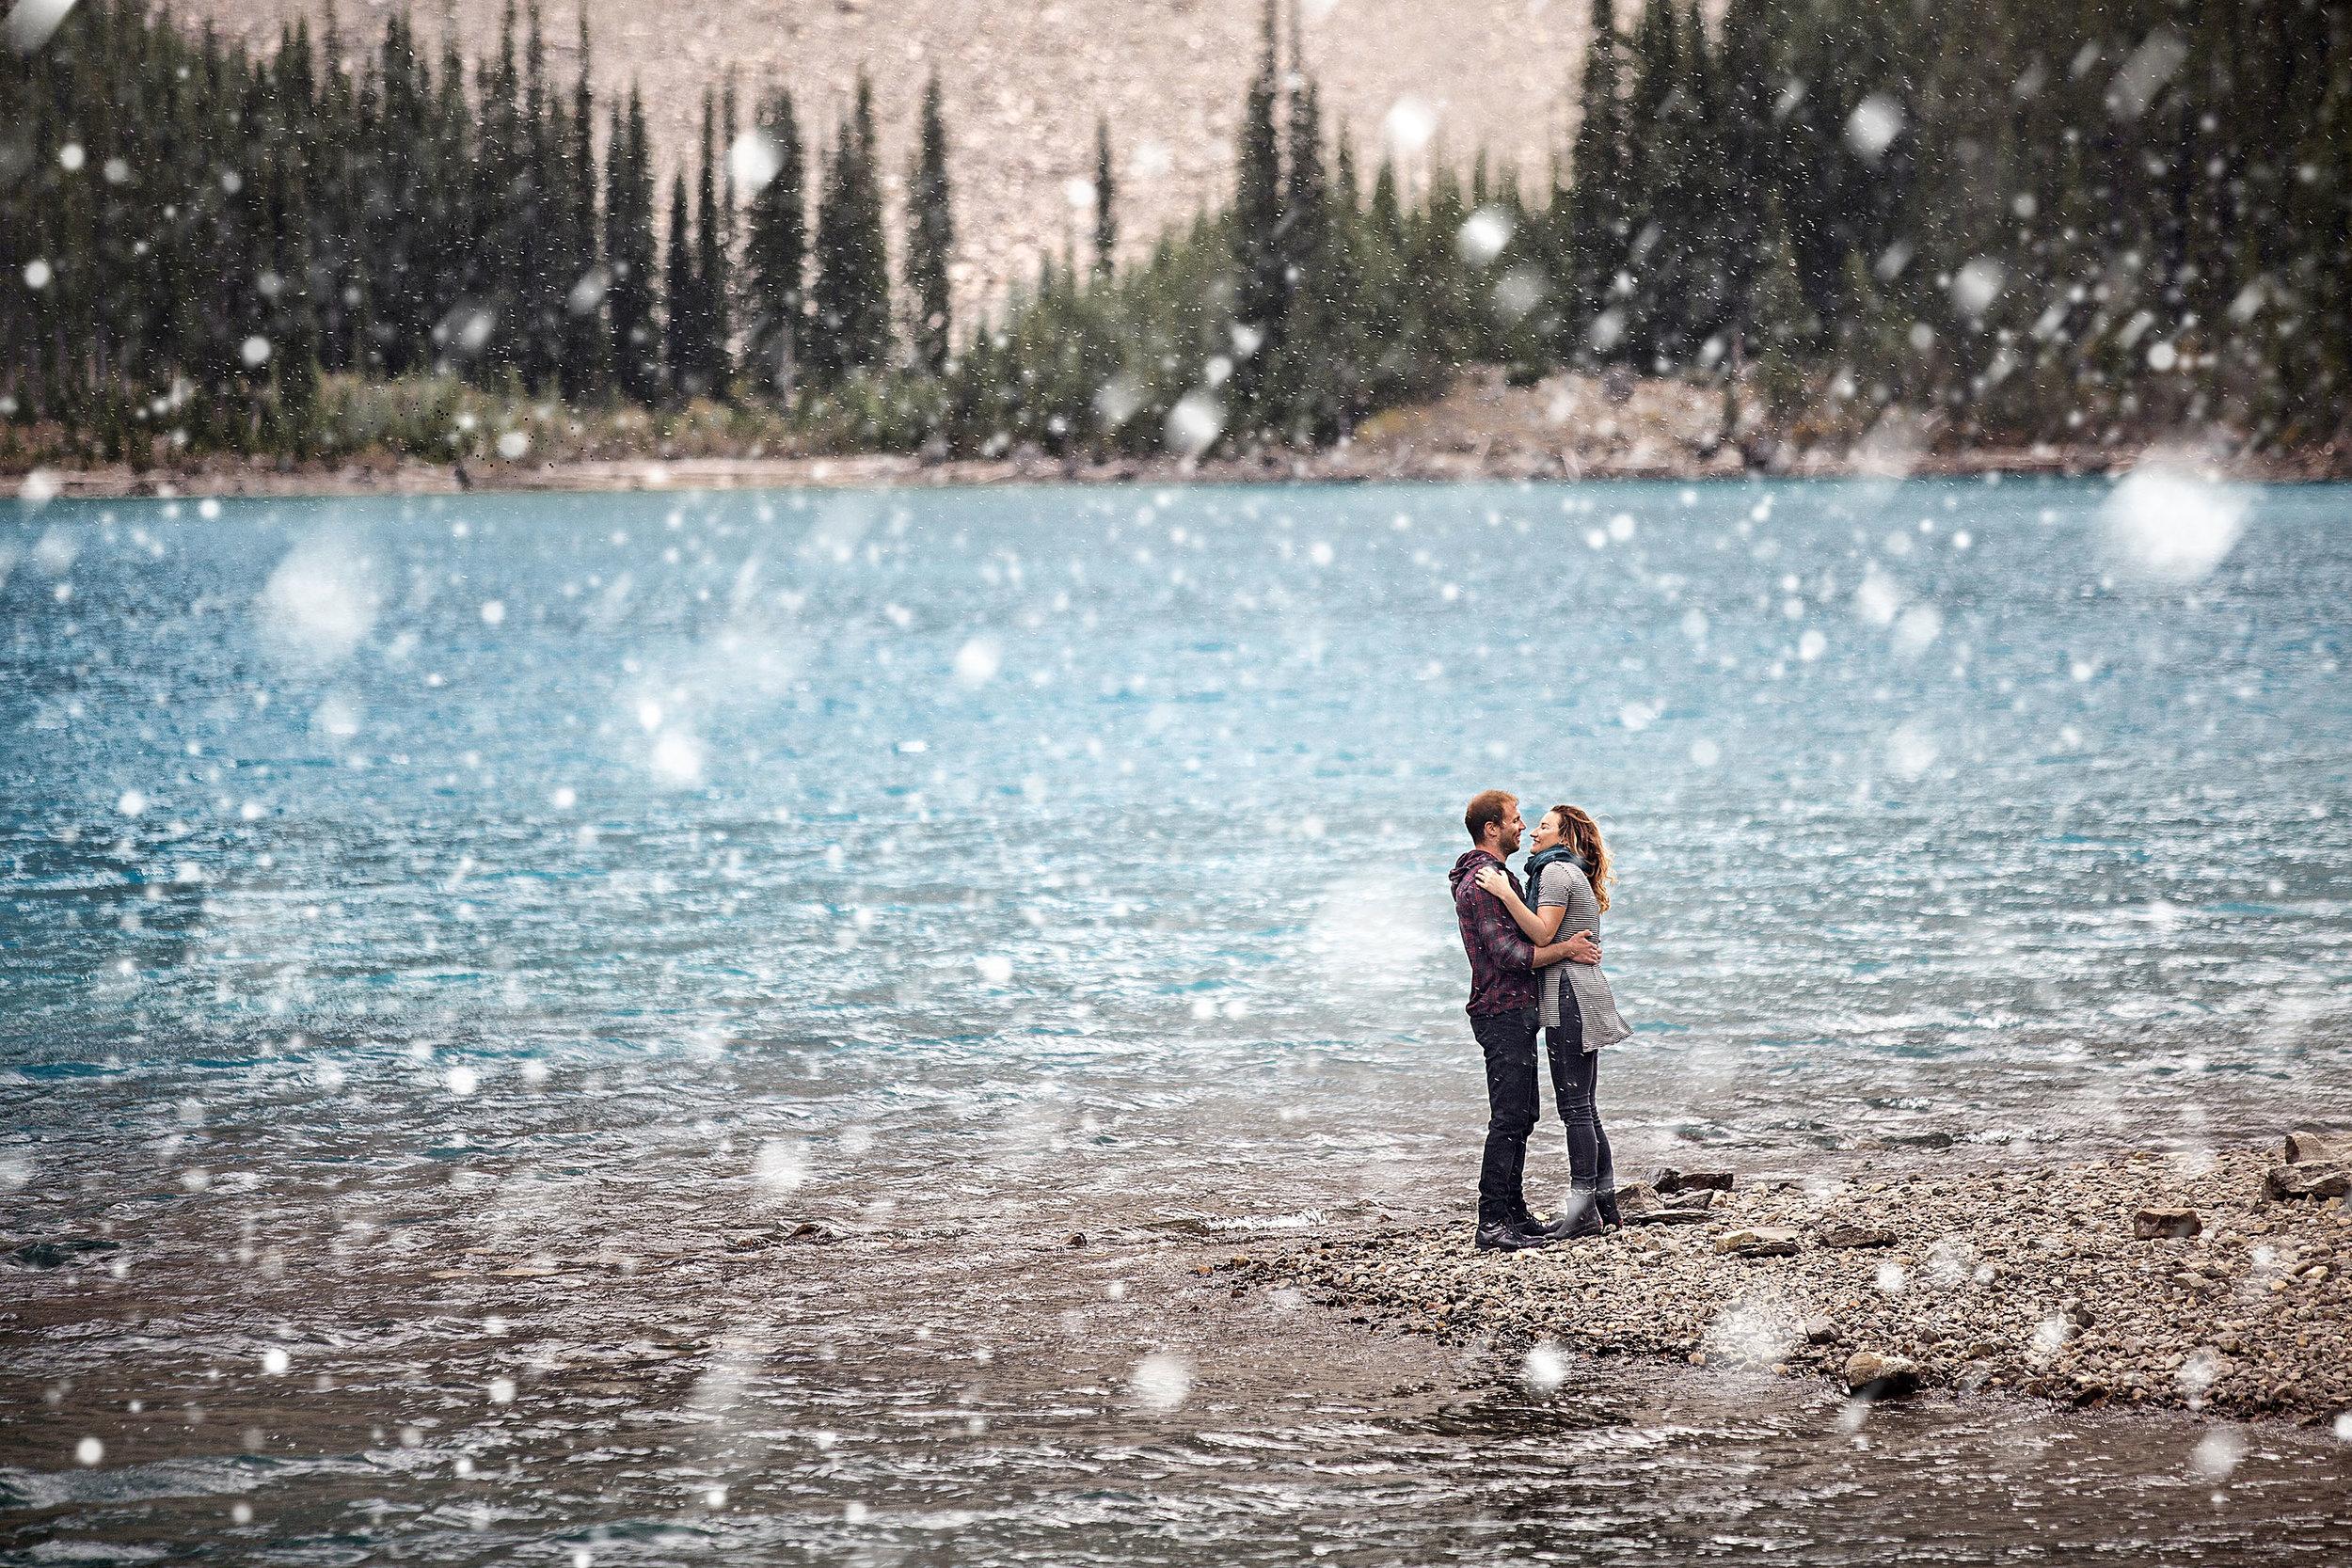 IMGblack_20160919_3977tcl_snow copy.jpg